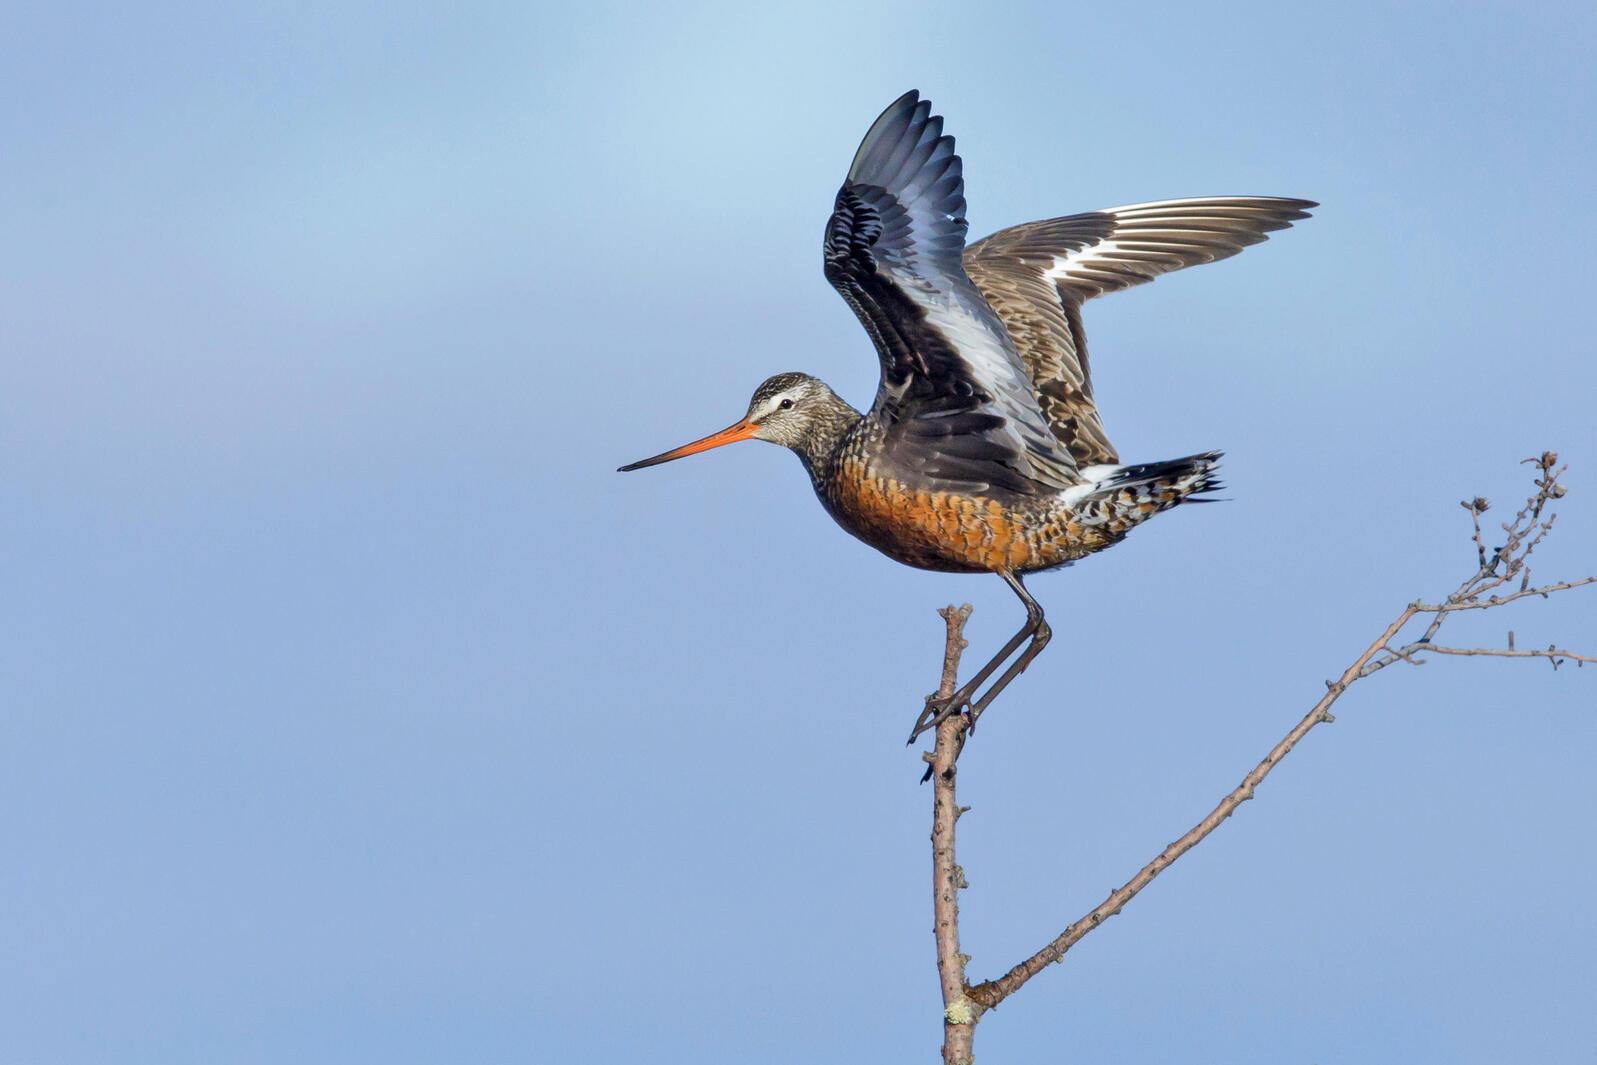 Hudsonian Godwit. Agami Photo Agency/Shutterstock